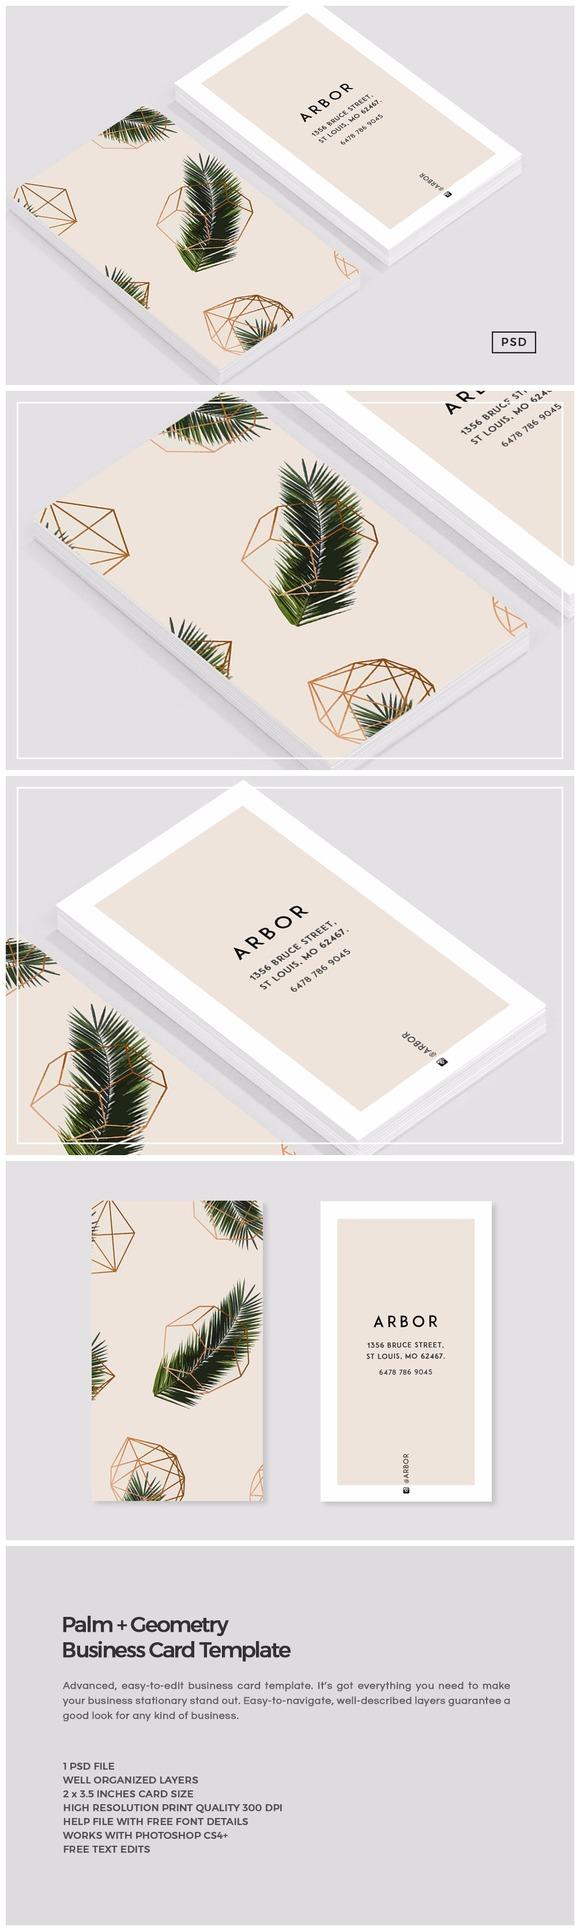 Palm Geometry Business Card